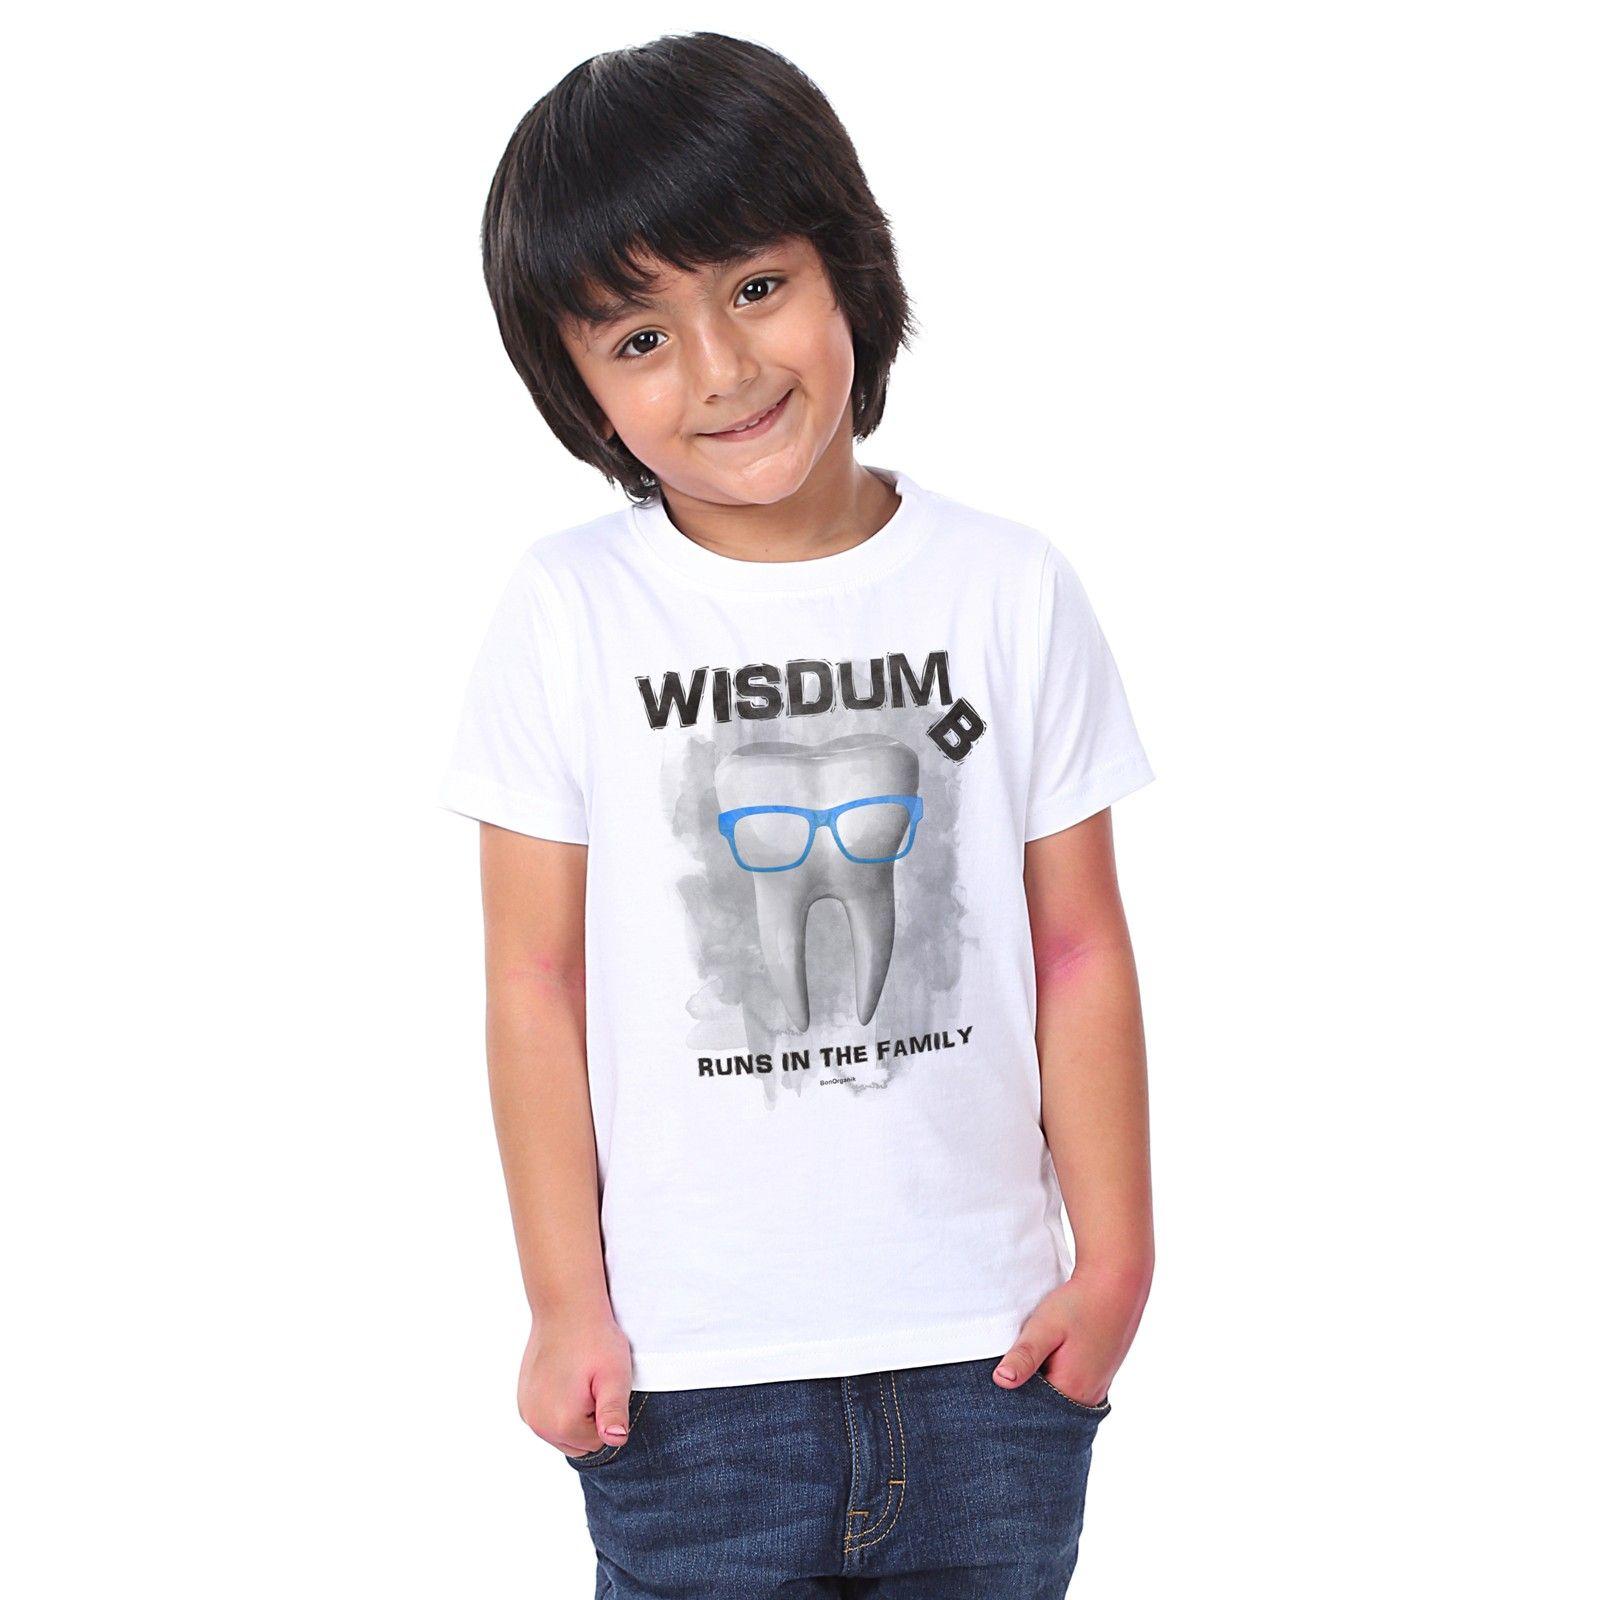 Boy's Wisdum Print White T-shirt - BonOrganik